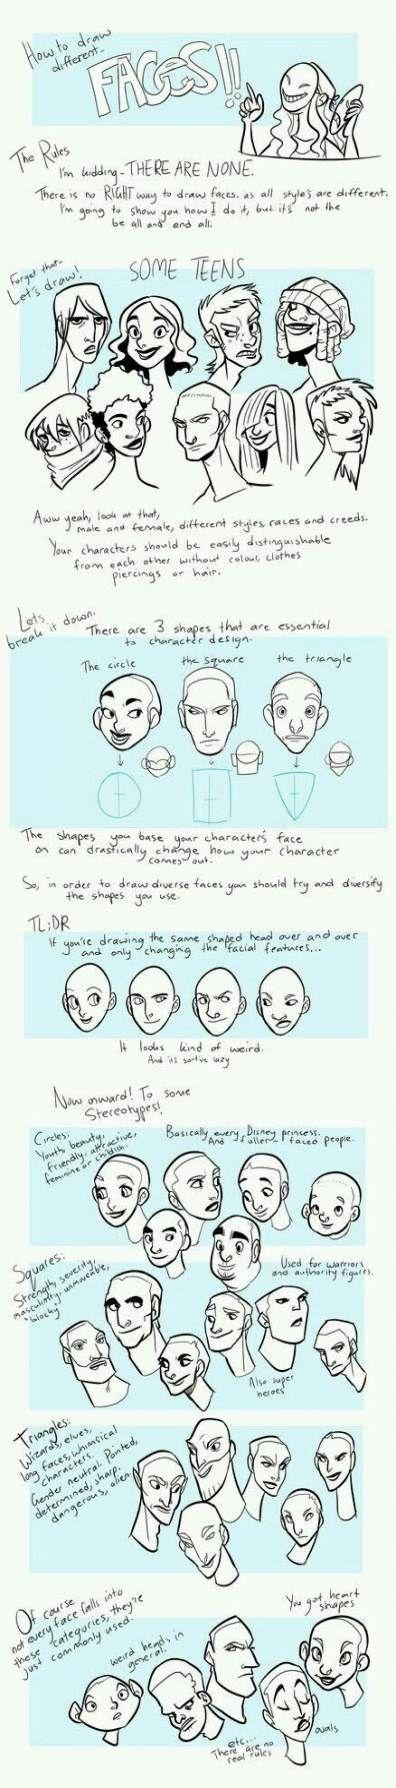 Doodle-Art-Leute zeichnen 50 Ideen